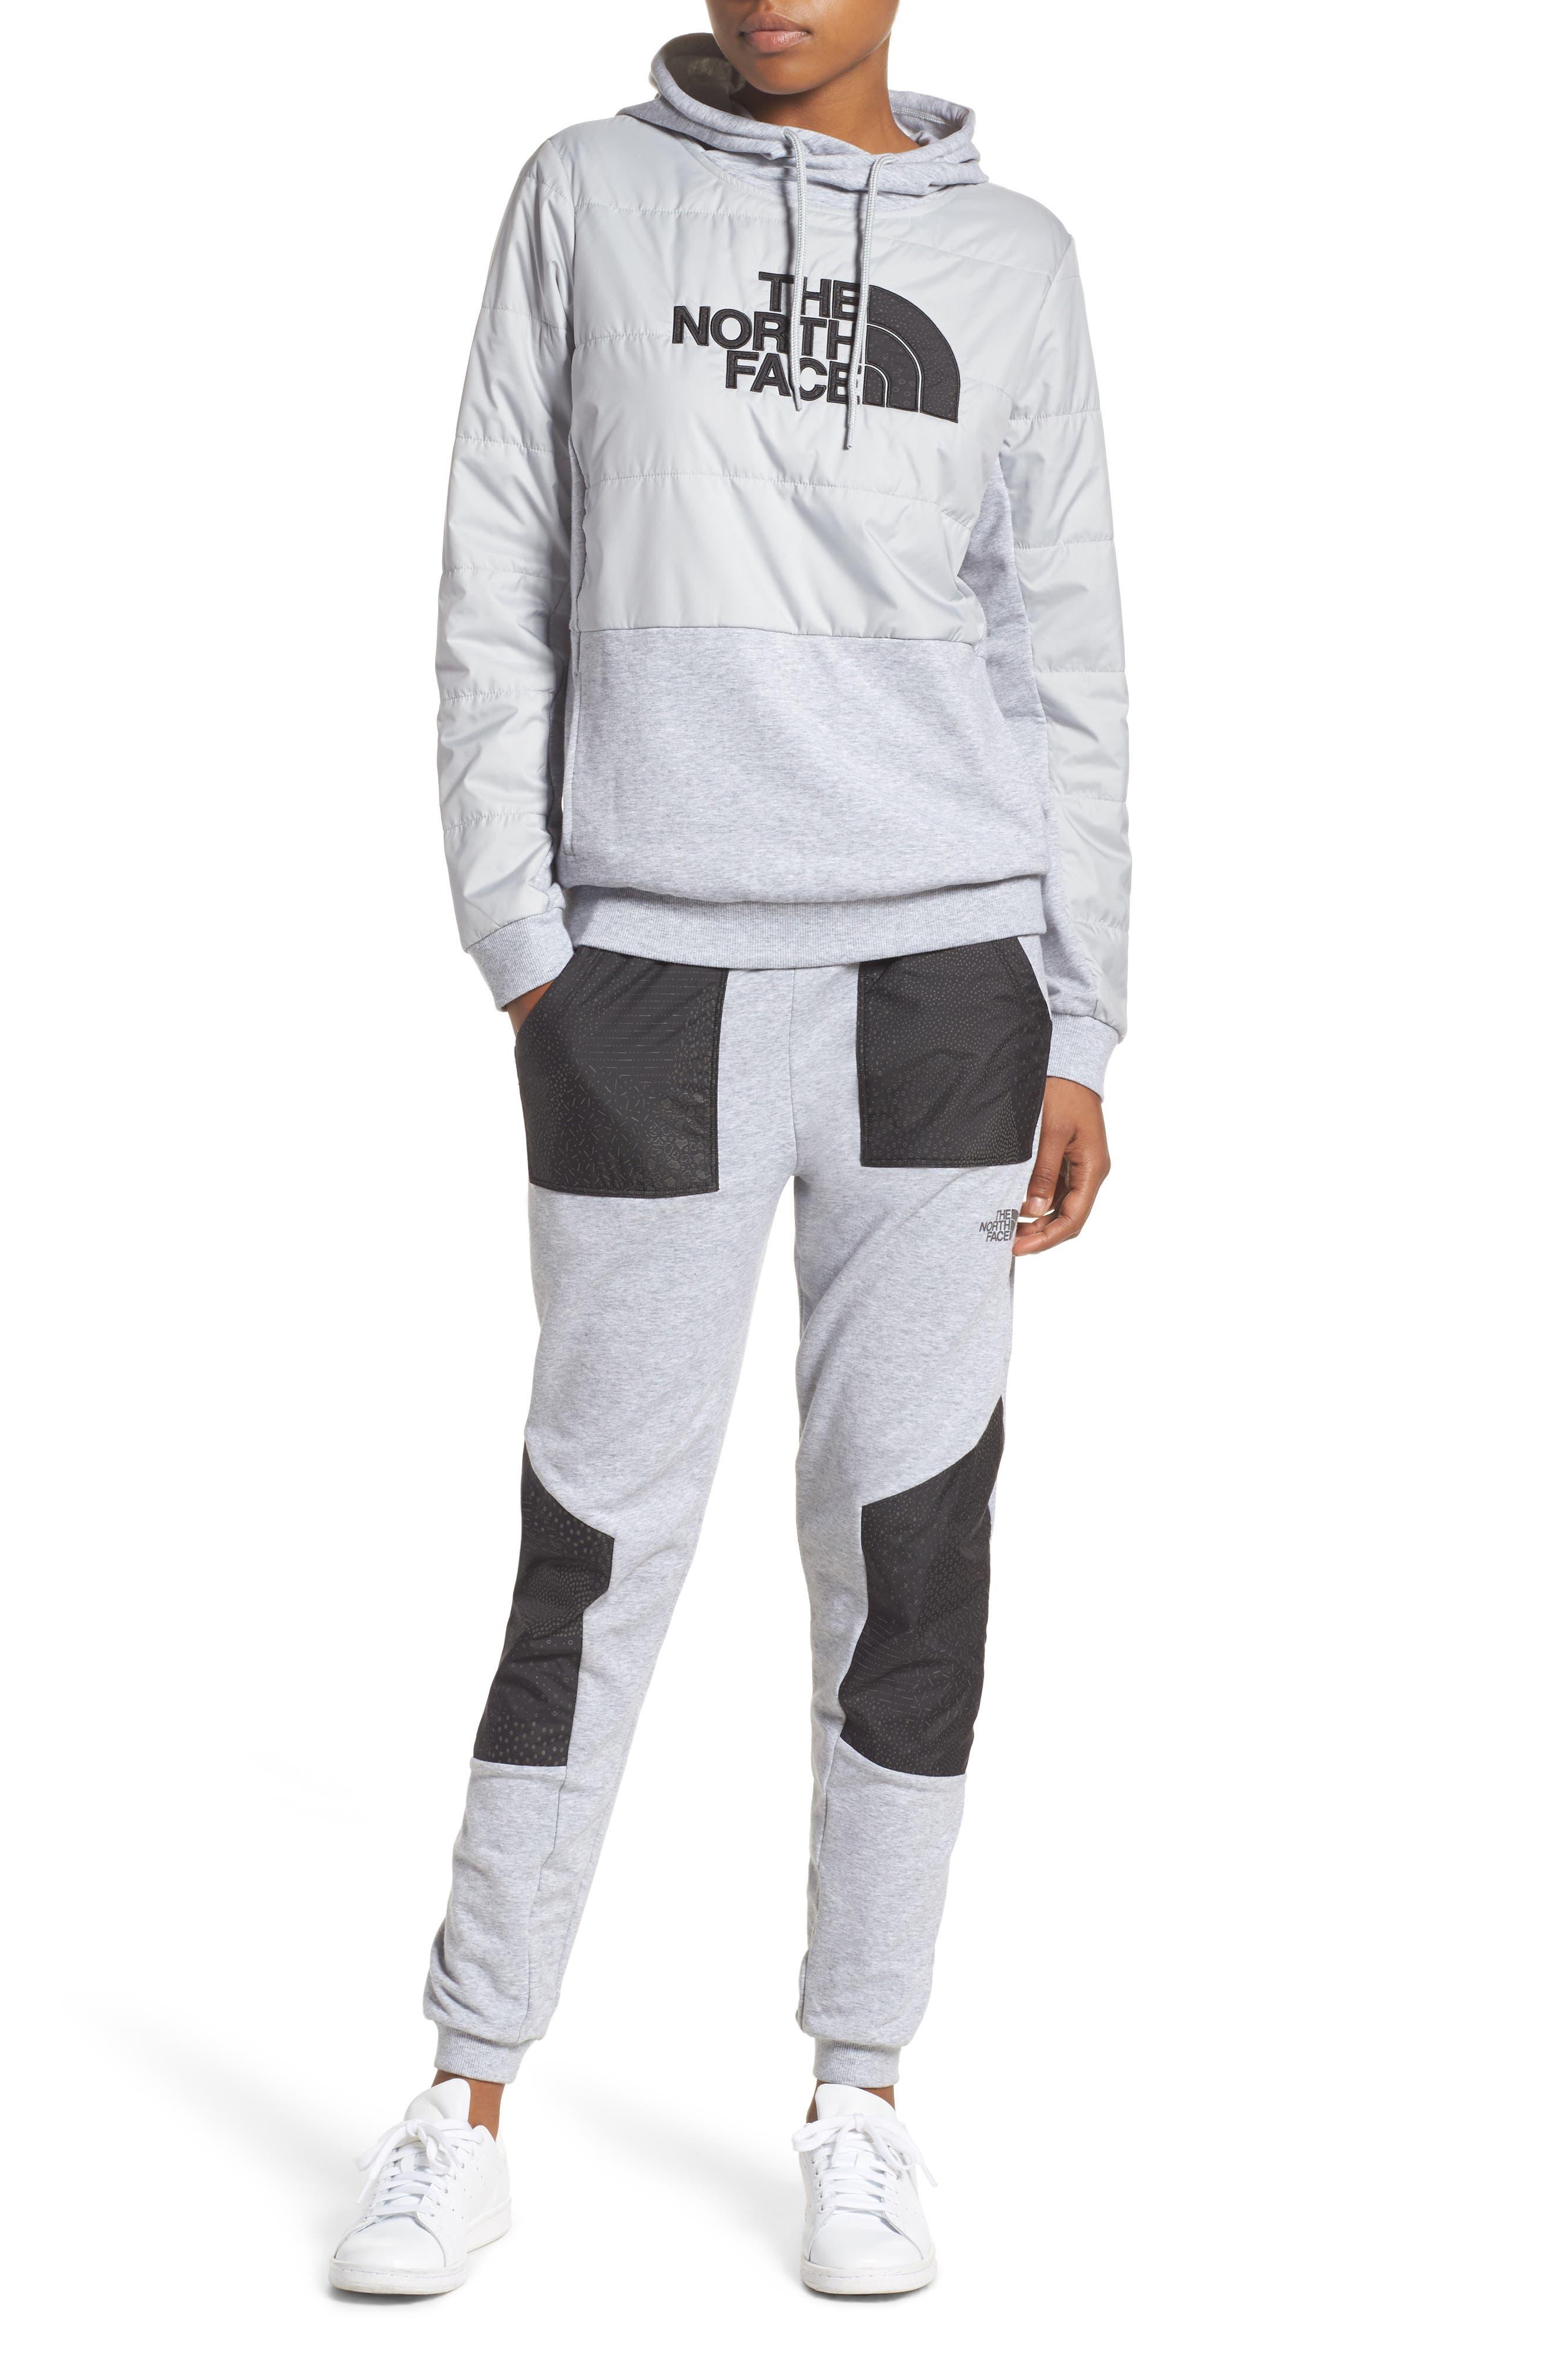 Reflective Jogger Pants,                             Alternate thumbnail 8, color,                             050